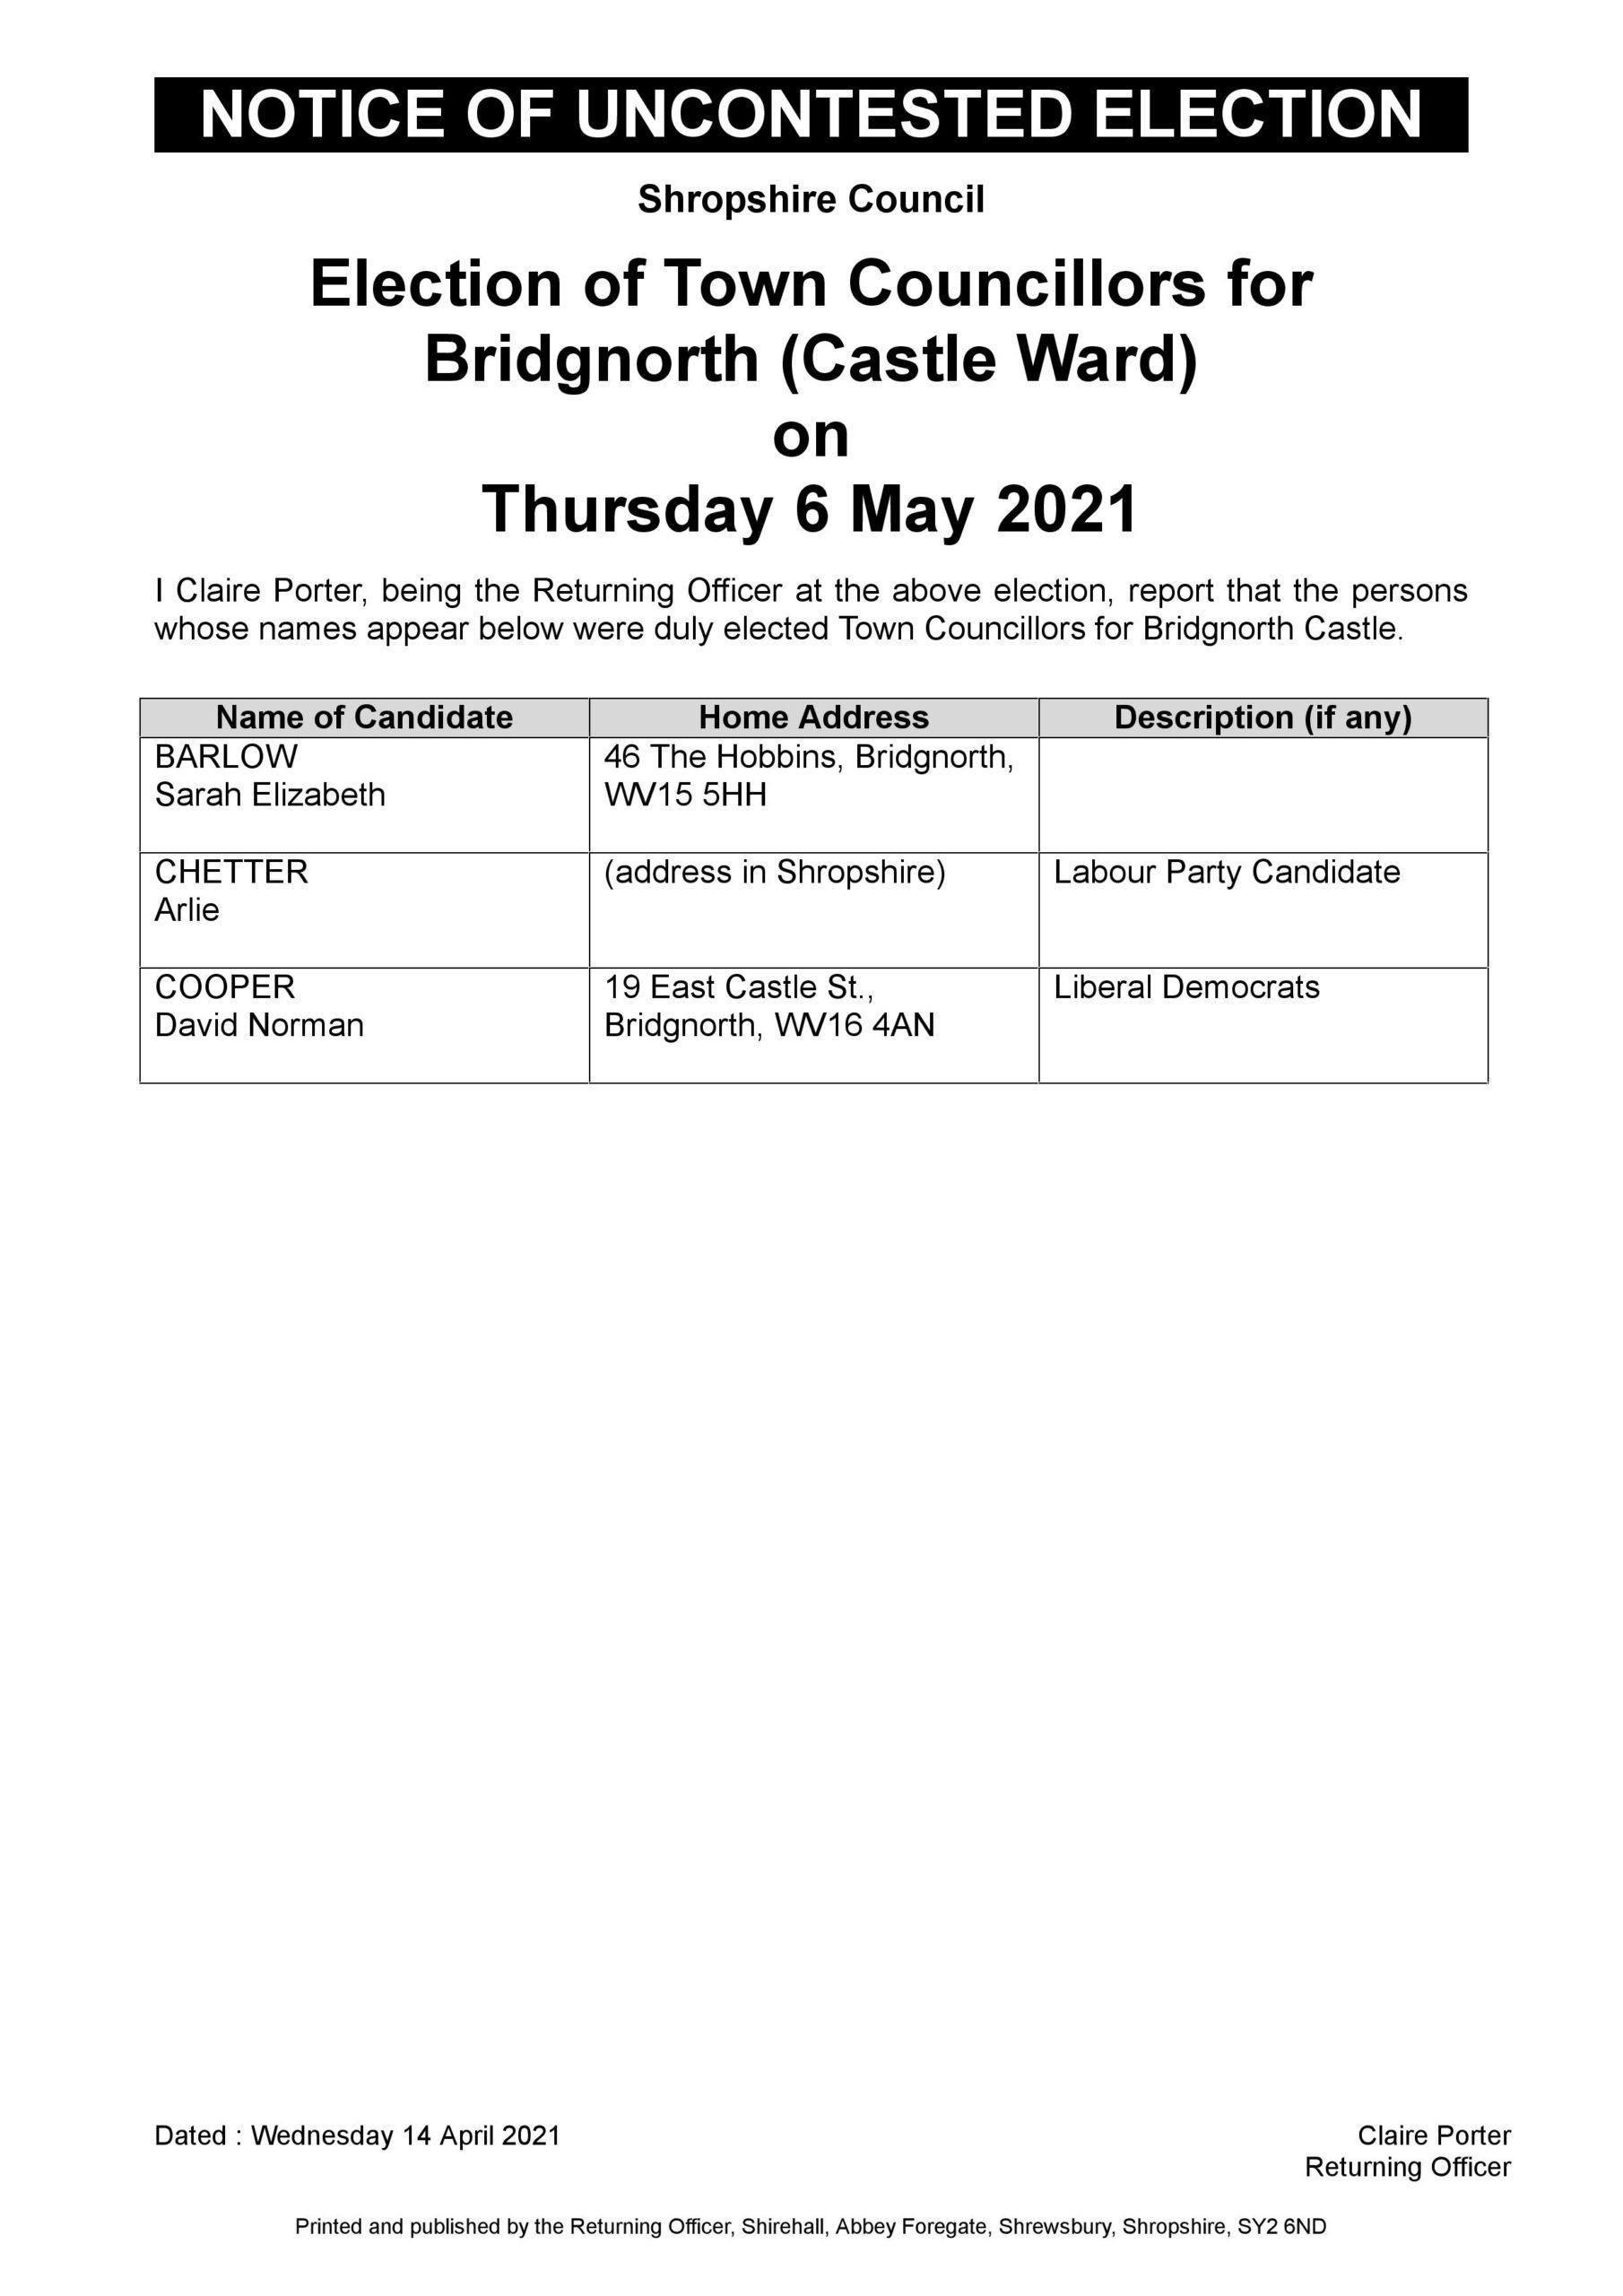 Uncontested Election Bridgnorth Castle